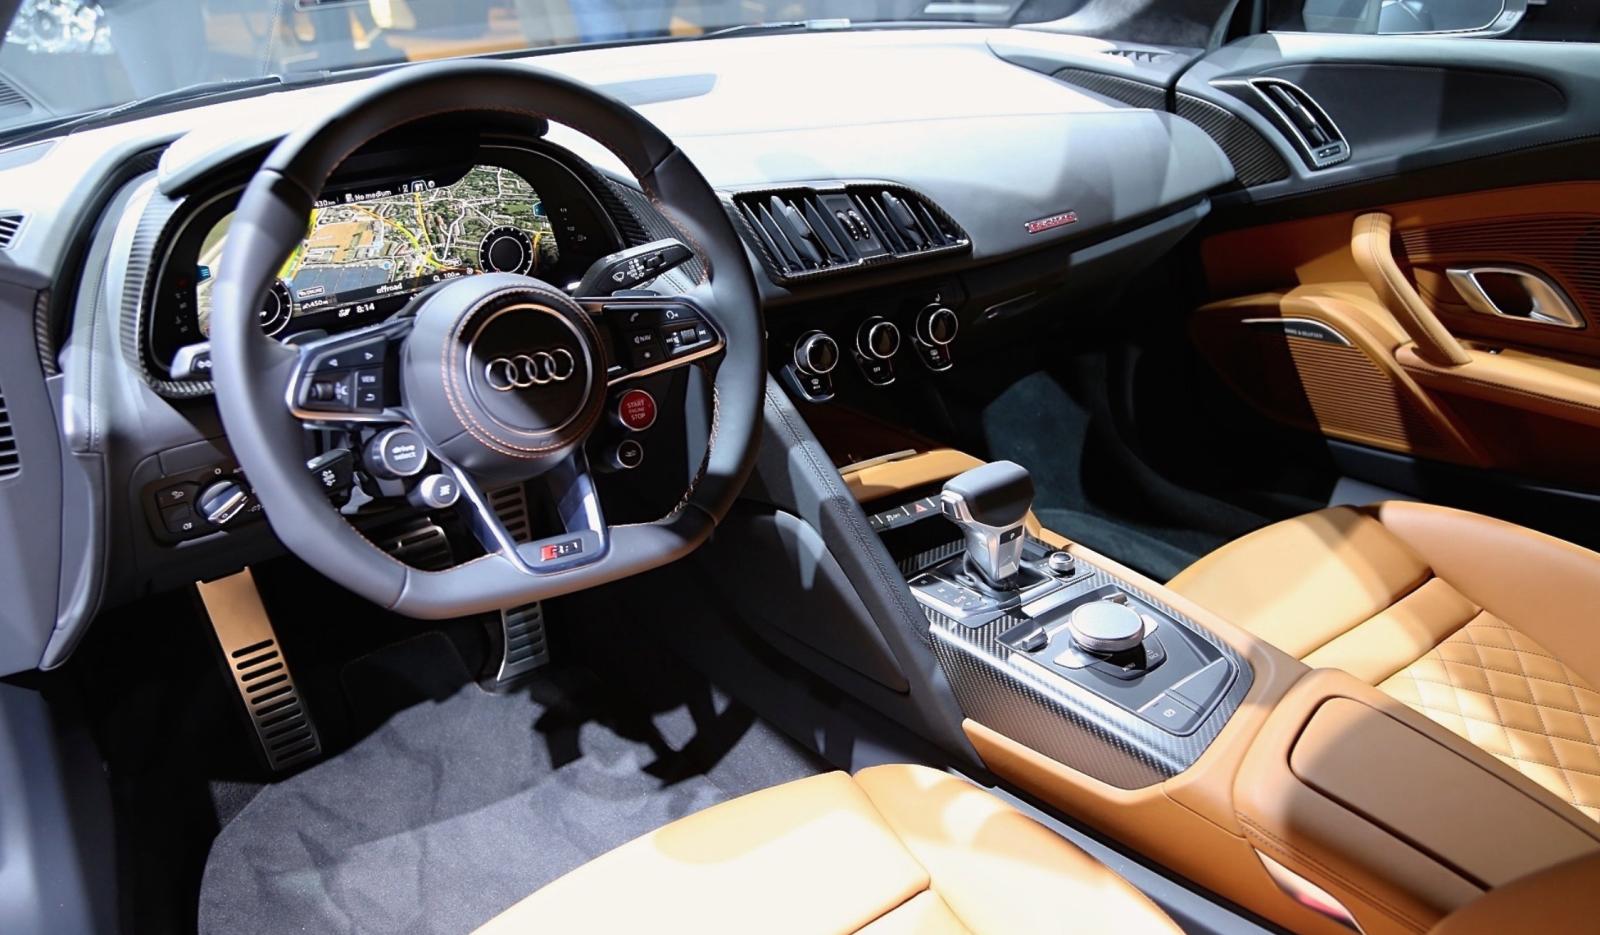 2016 audi r8 interior  Audi  Audi Audi q7 Audi r8 interior